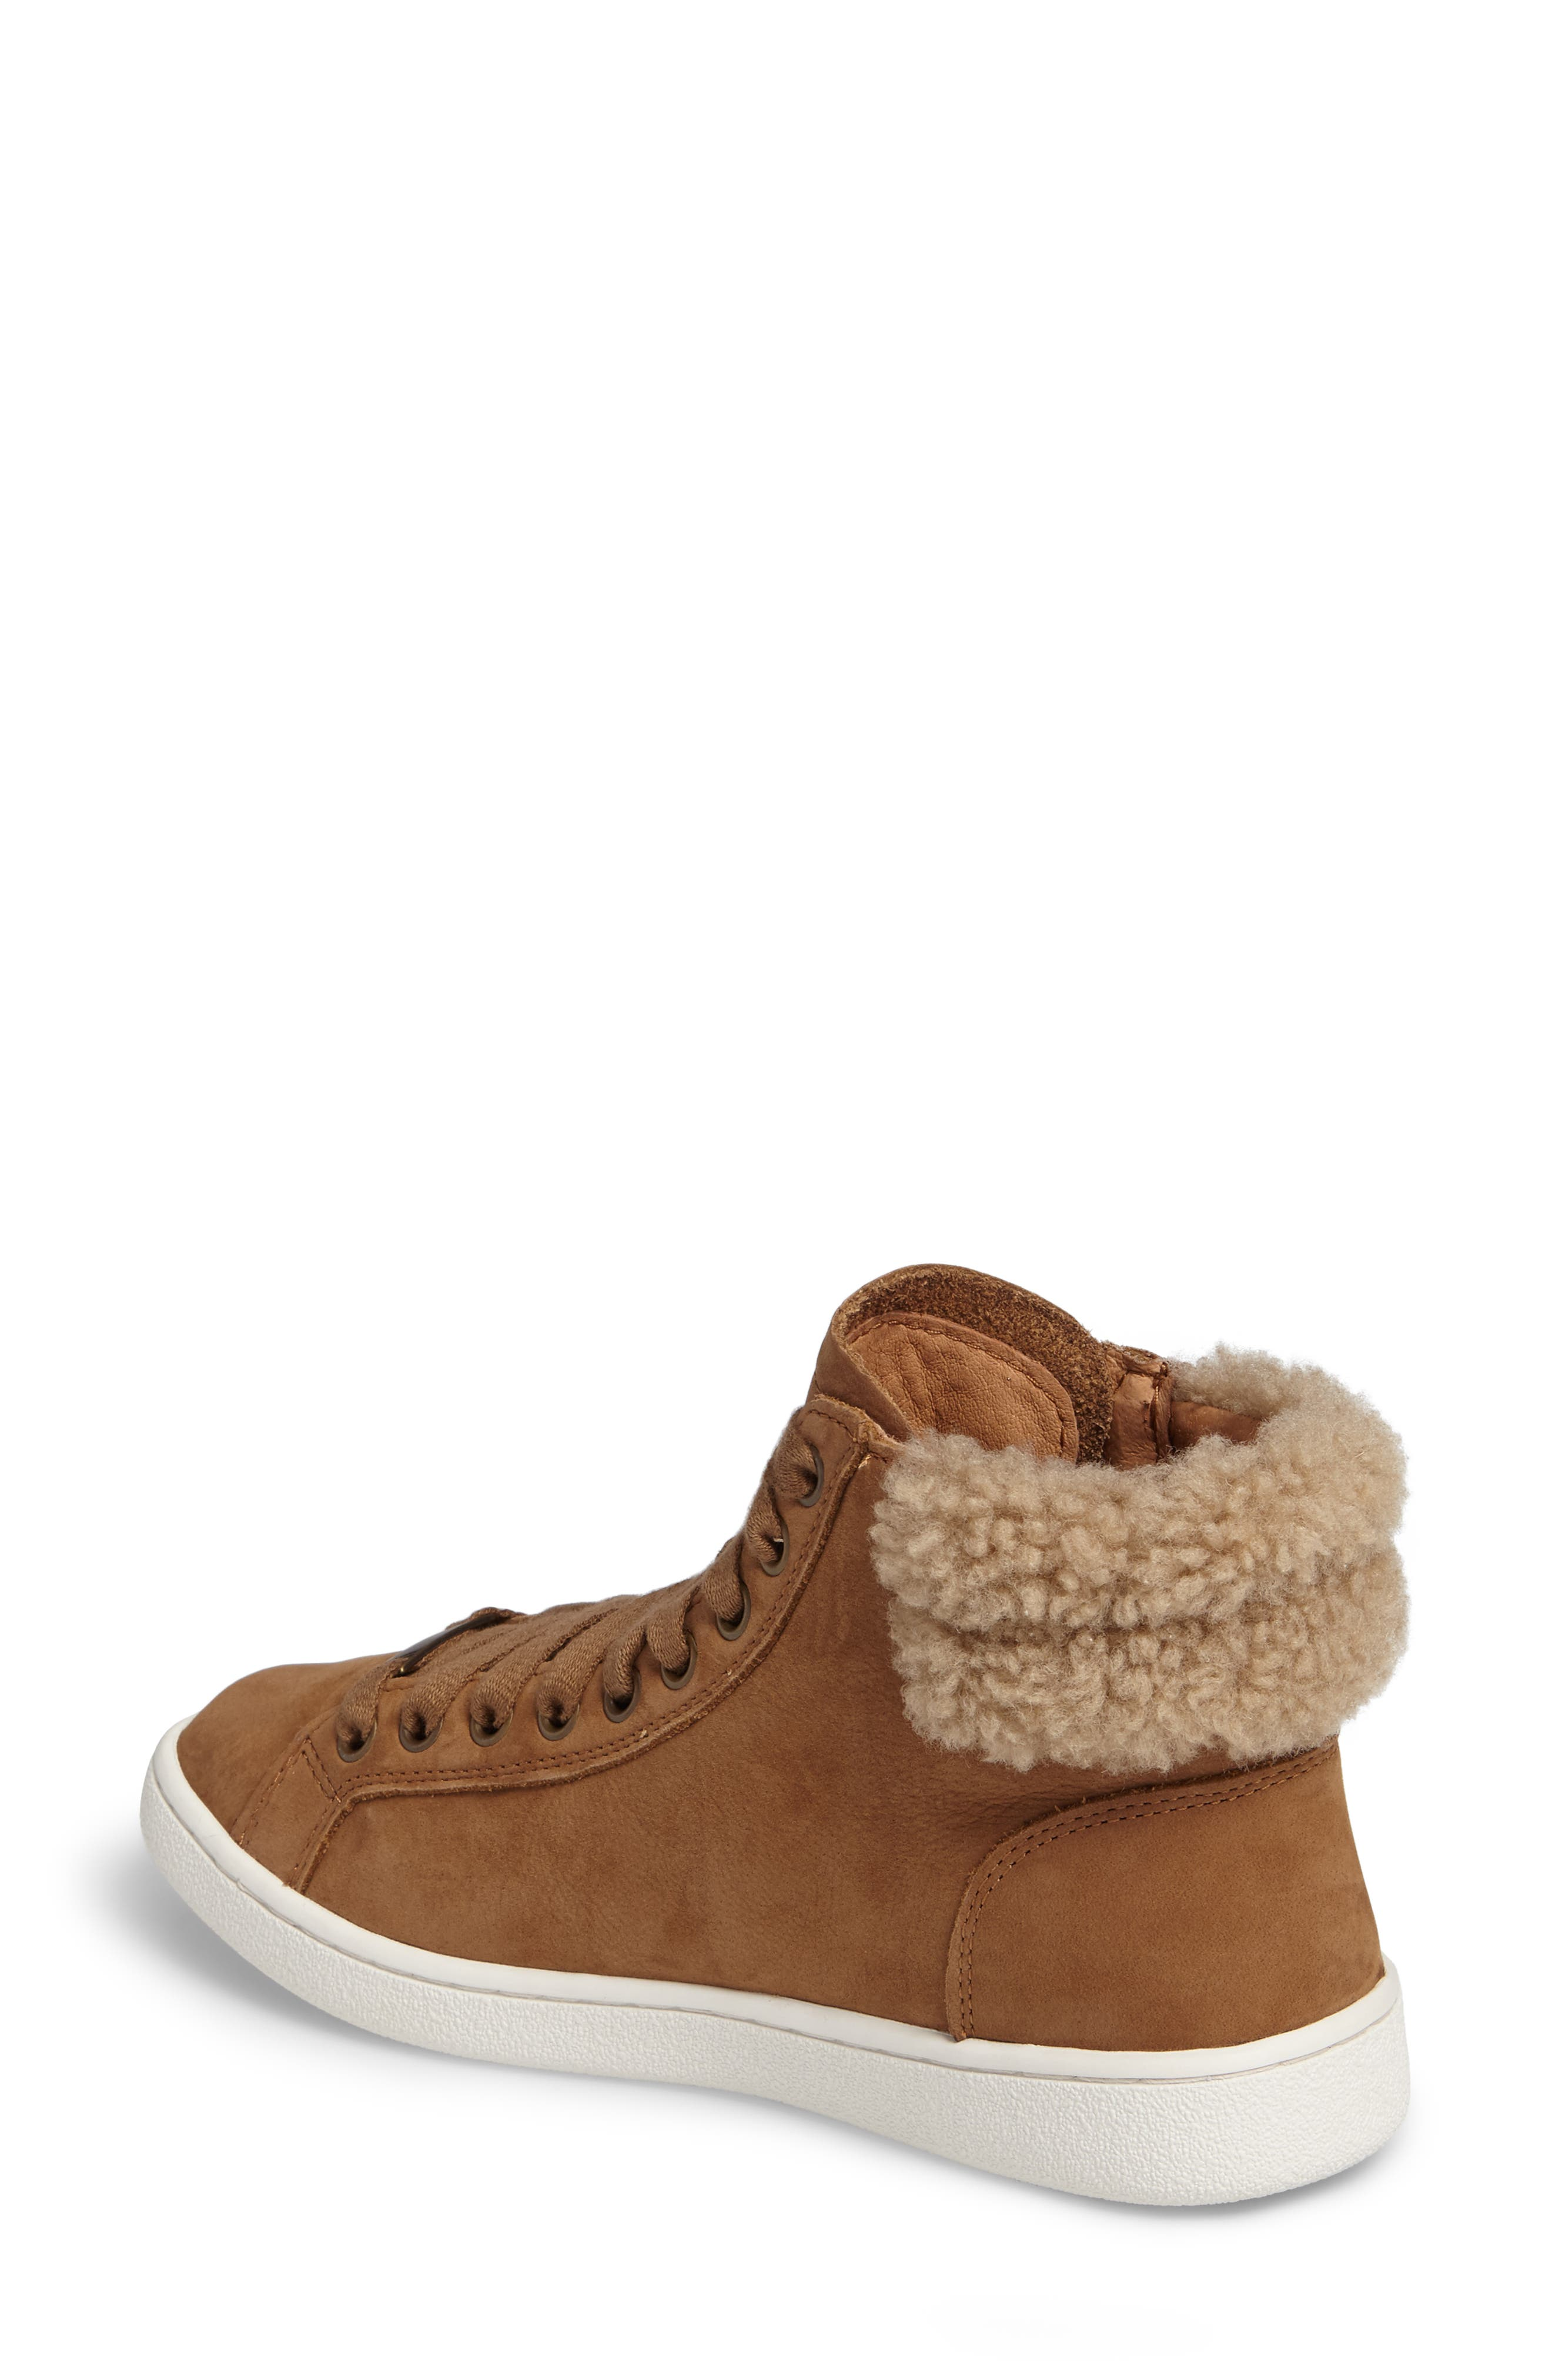 Alternate Image 2  - UGG® Olive Genuine Shearling Cuff Sneaker (Women)